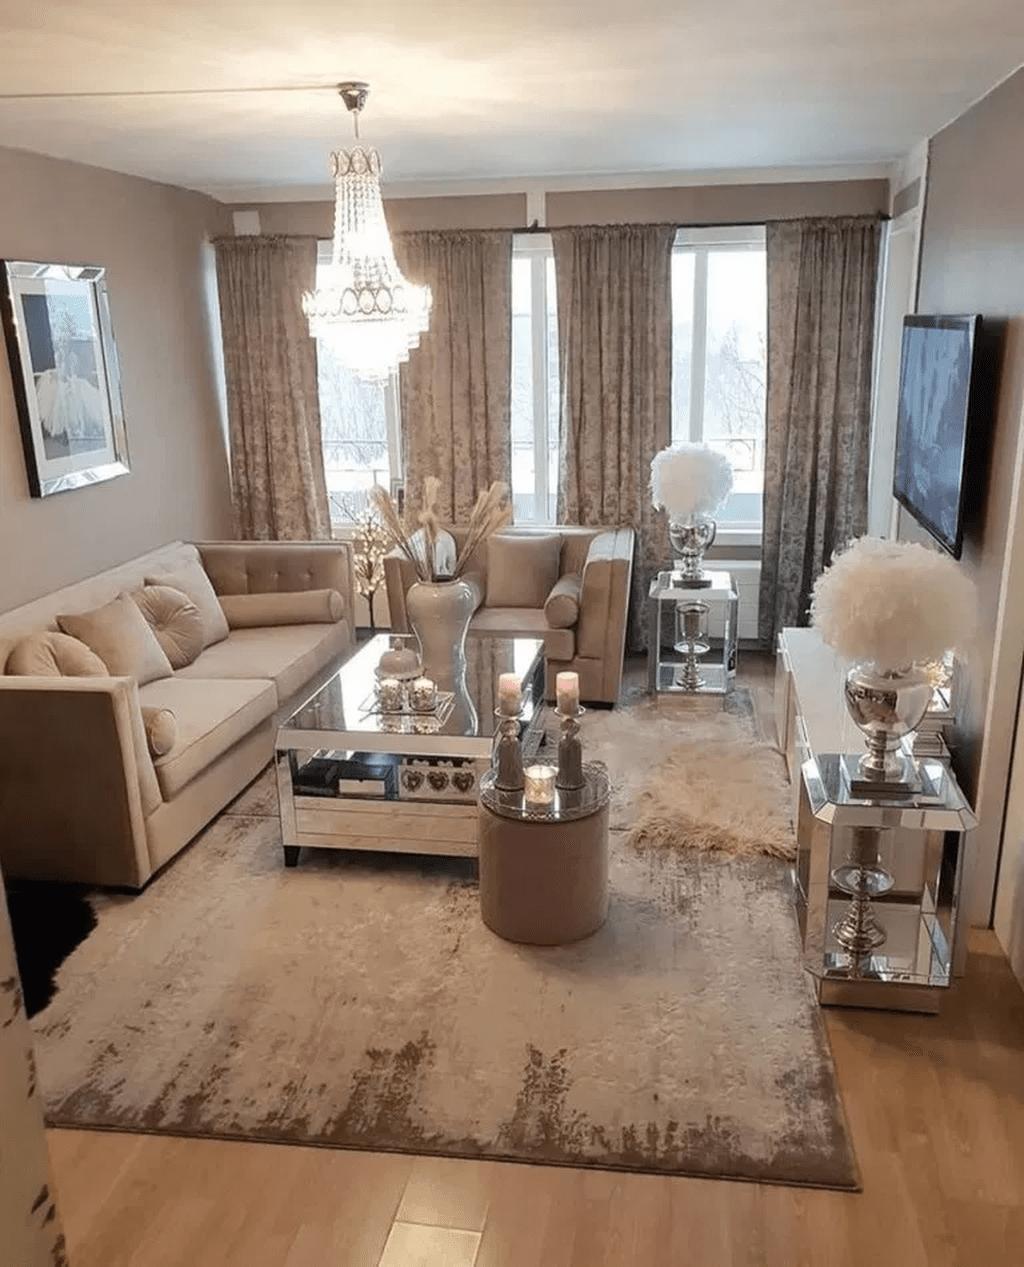 30 Inspiring Living Room Furniture Ideas Look Beautiful Homyhomee Living Room Decor Apartment Small Living Room Decor Elegant Living Room Decor